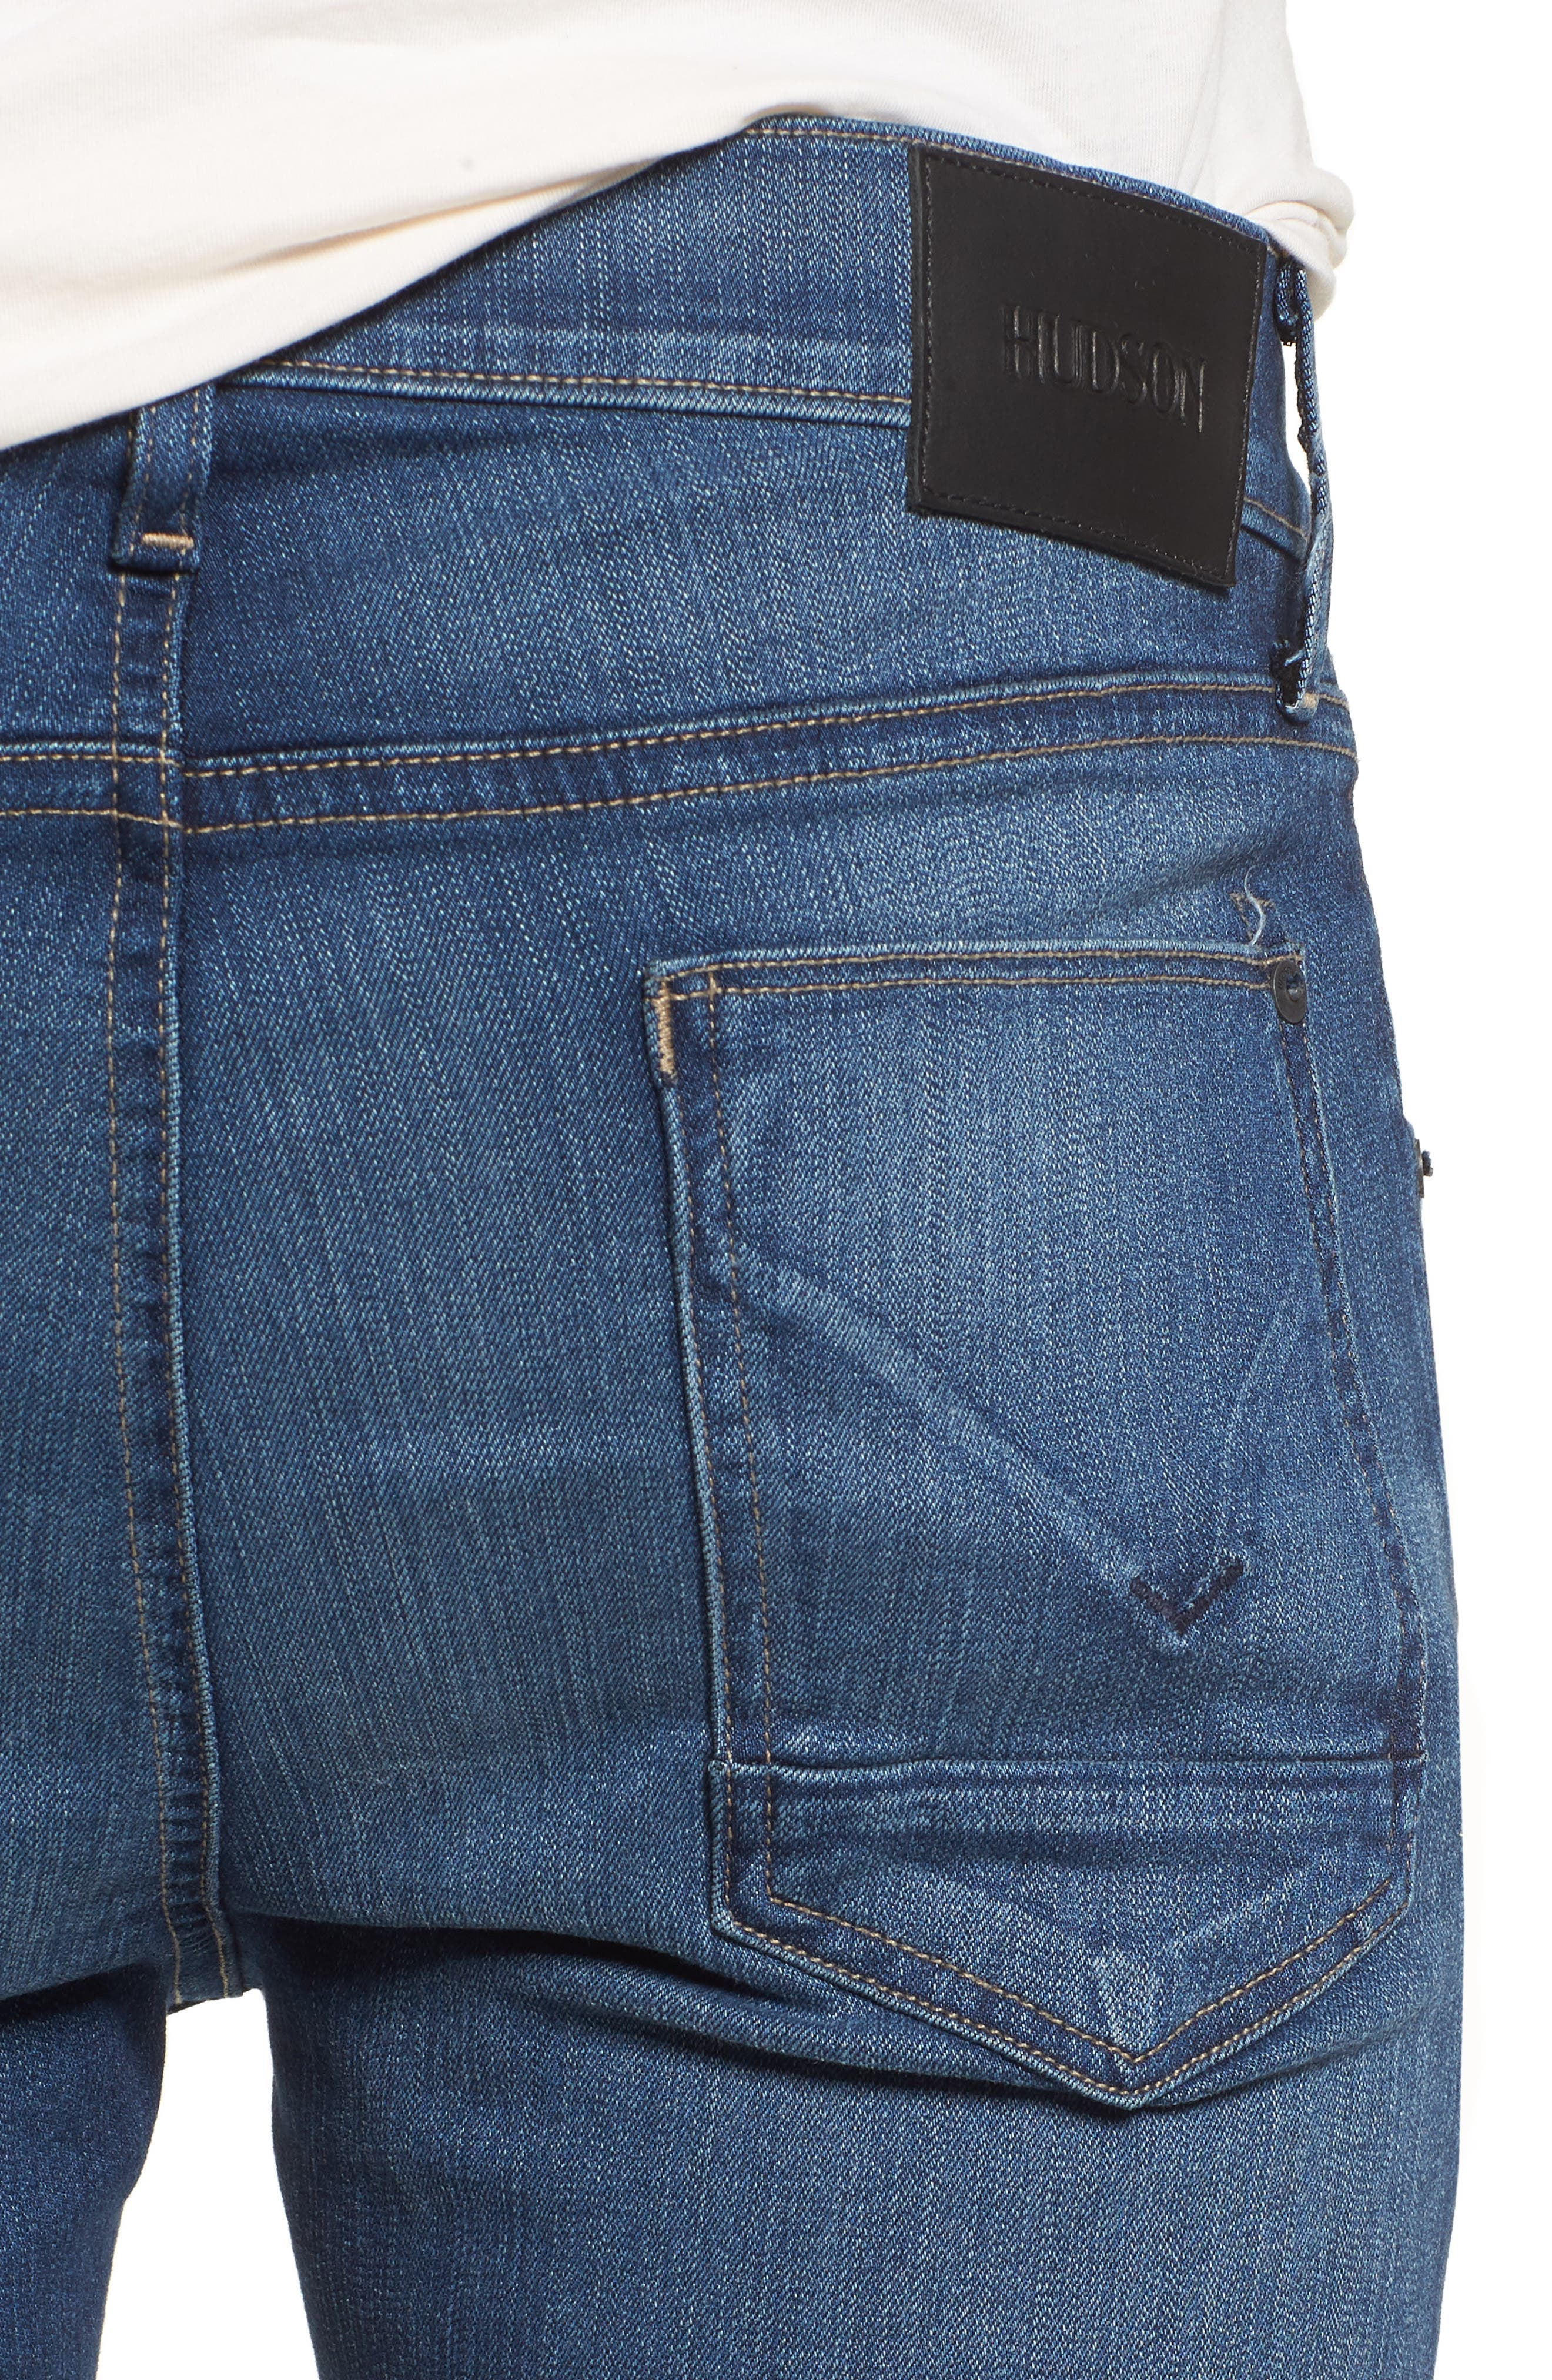 Hudson Blake Slim Fit Jeans,                             Alternate thumbnail 4, color,                             421